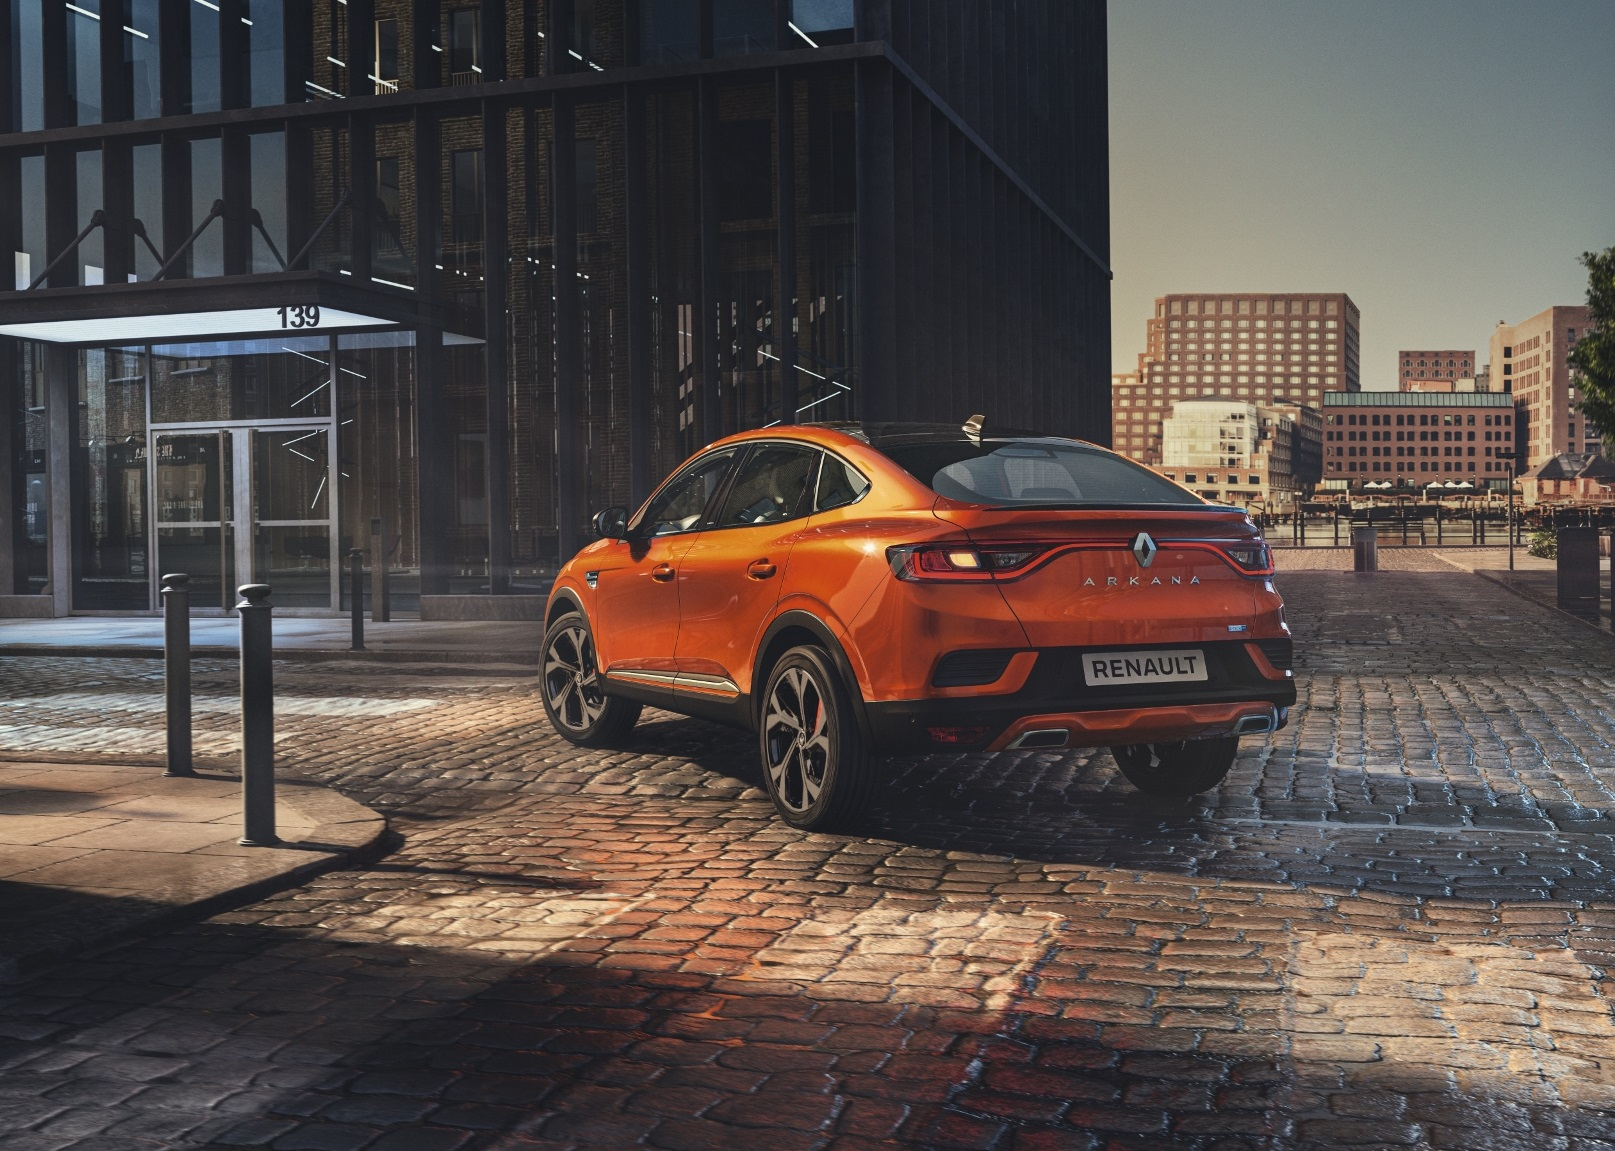 Elegantný Renault Arkana mieri do Európy